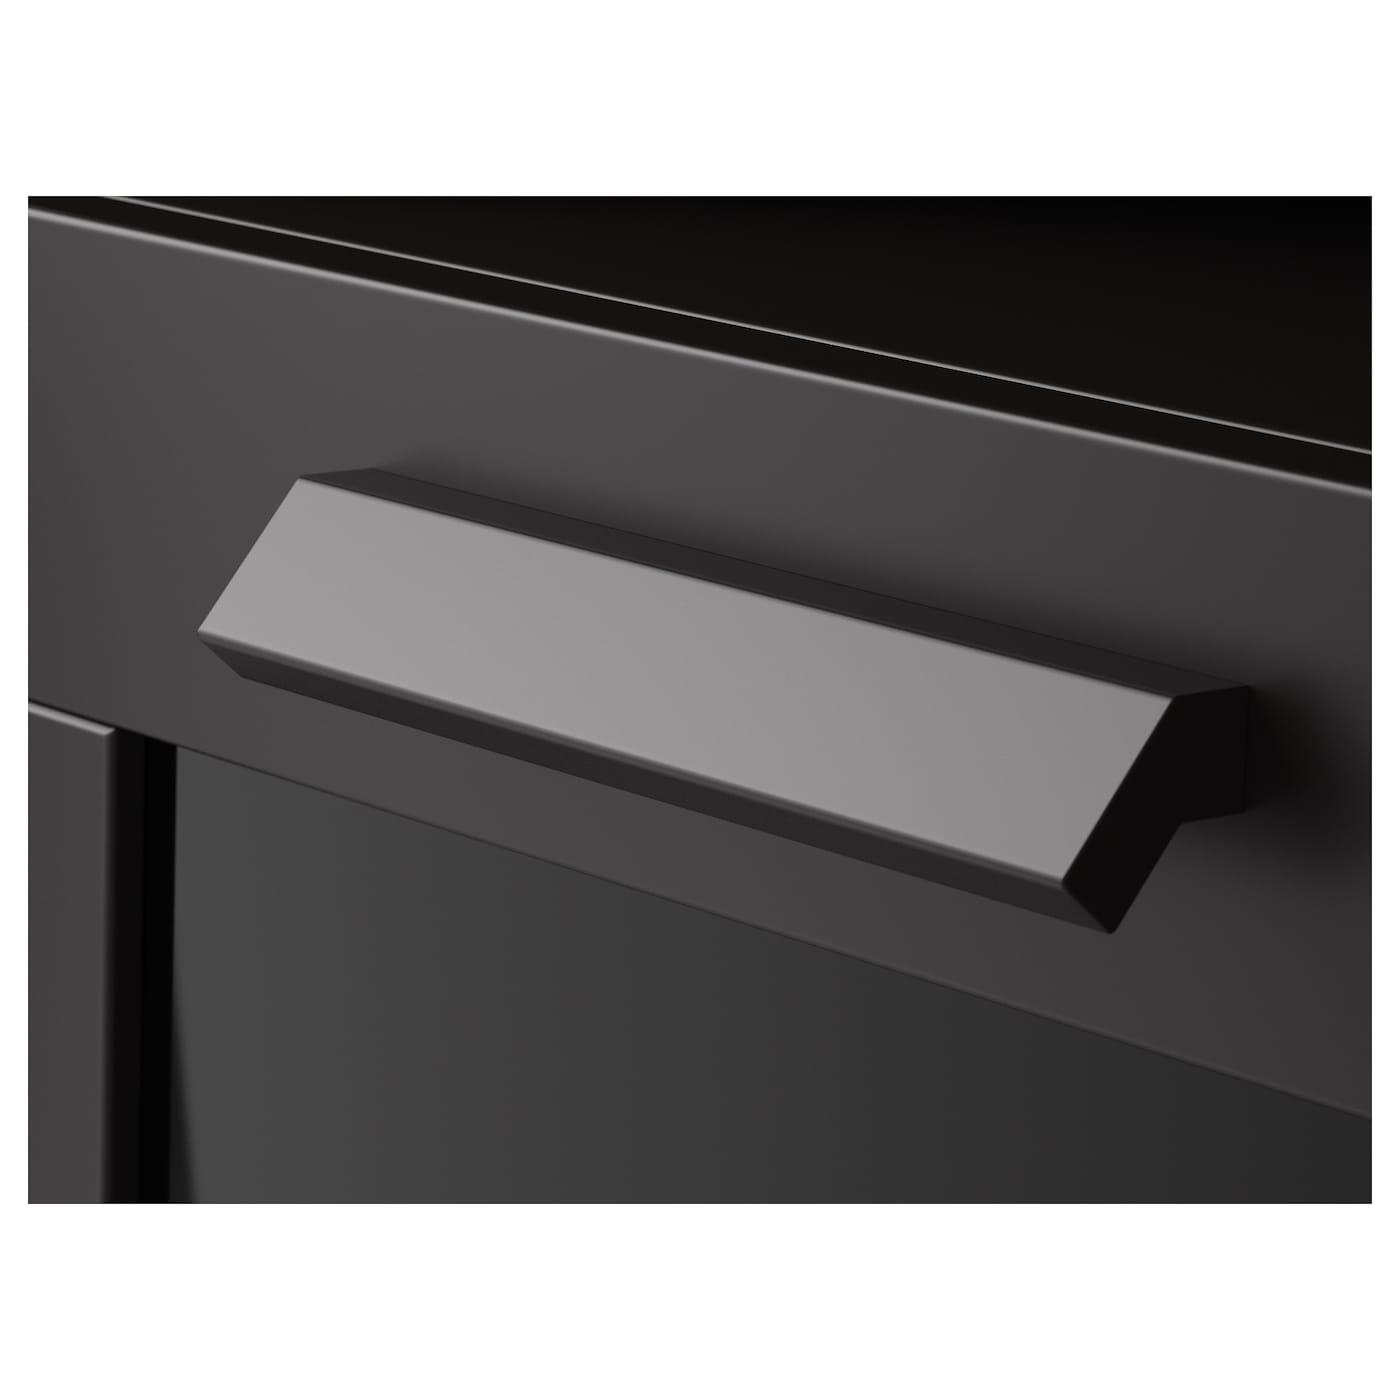 brimnes commode 2 tiroirs noir 50 x 77 cm ikea. Black Bedroom Furniture Sets. Home Design Ideas